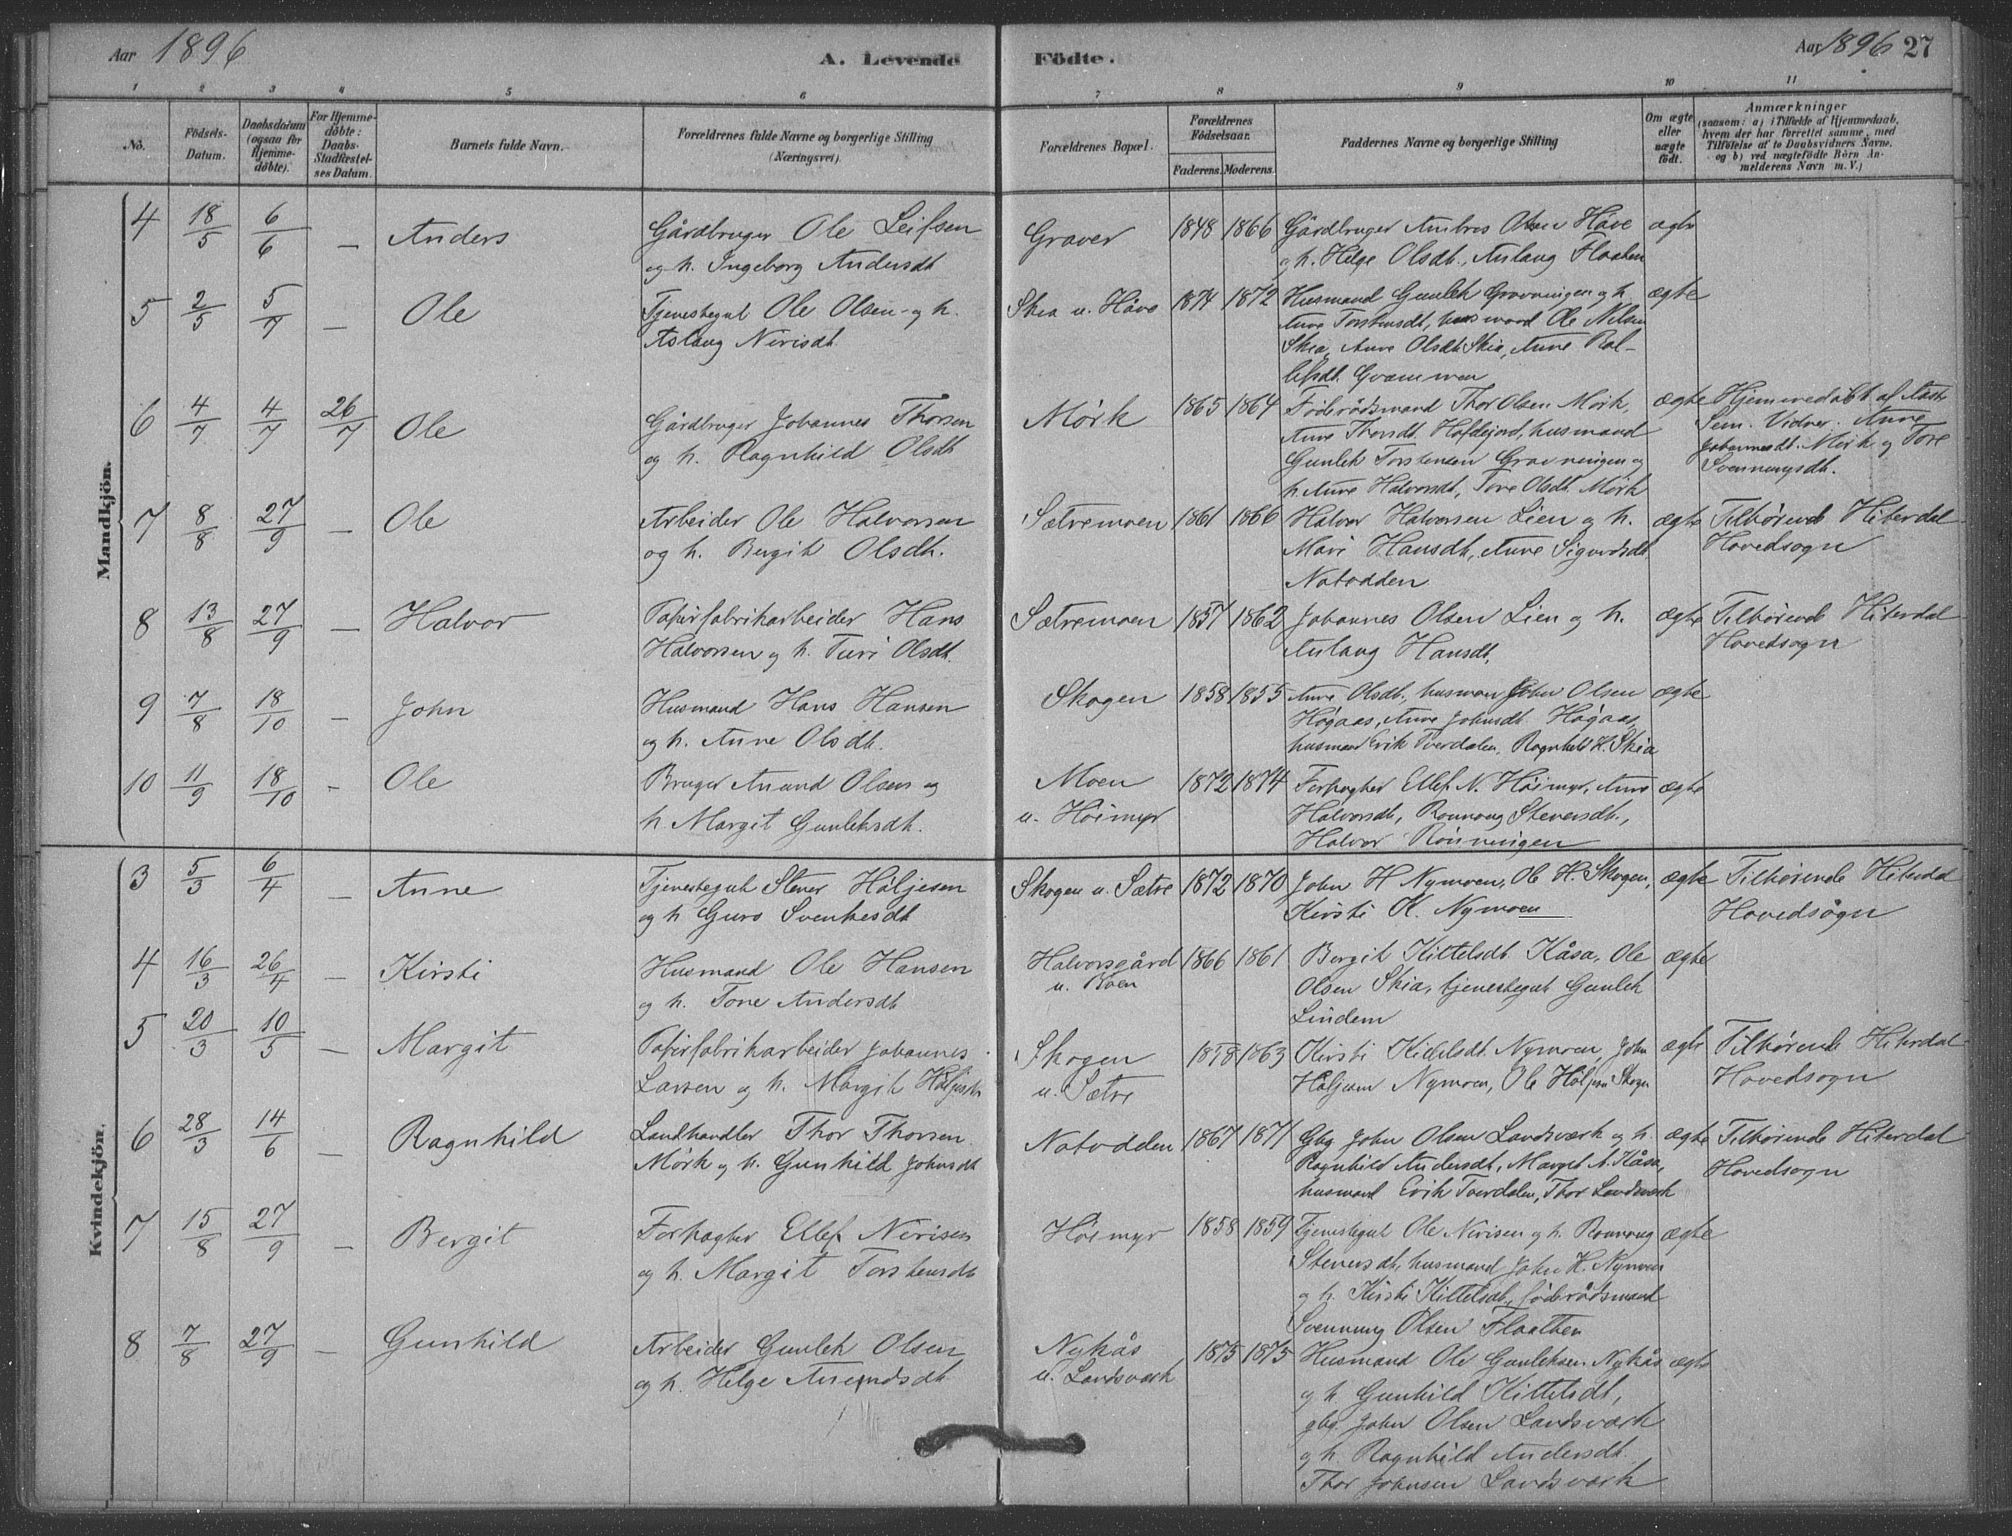 SAKO, Heddal kirkebøker, F/Fb/L0002: Ministerialbok nr. II 2, 1878-1913, s. 27